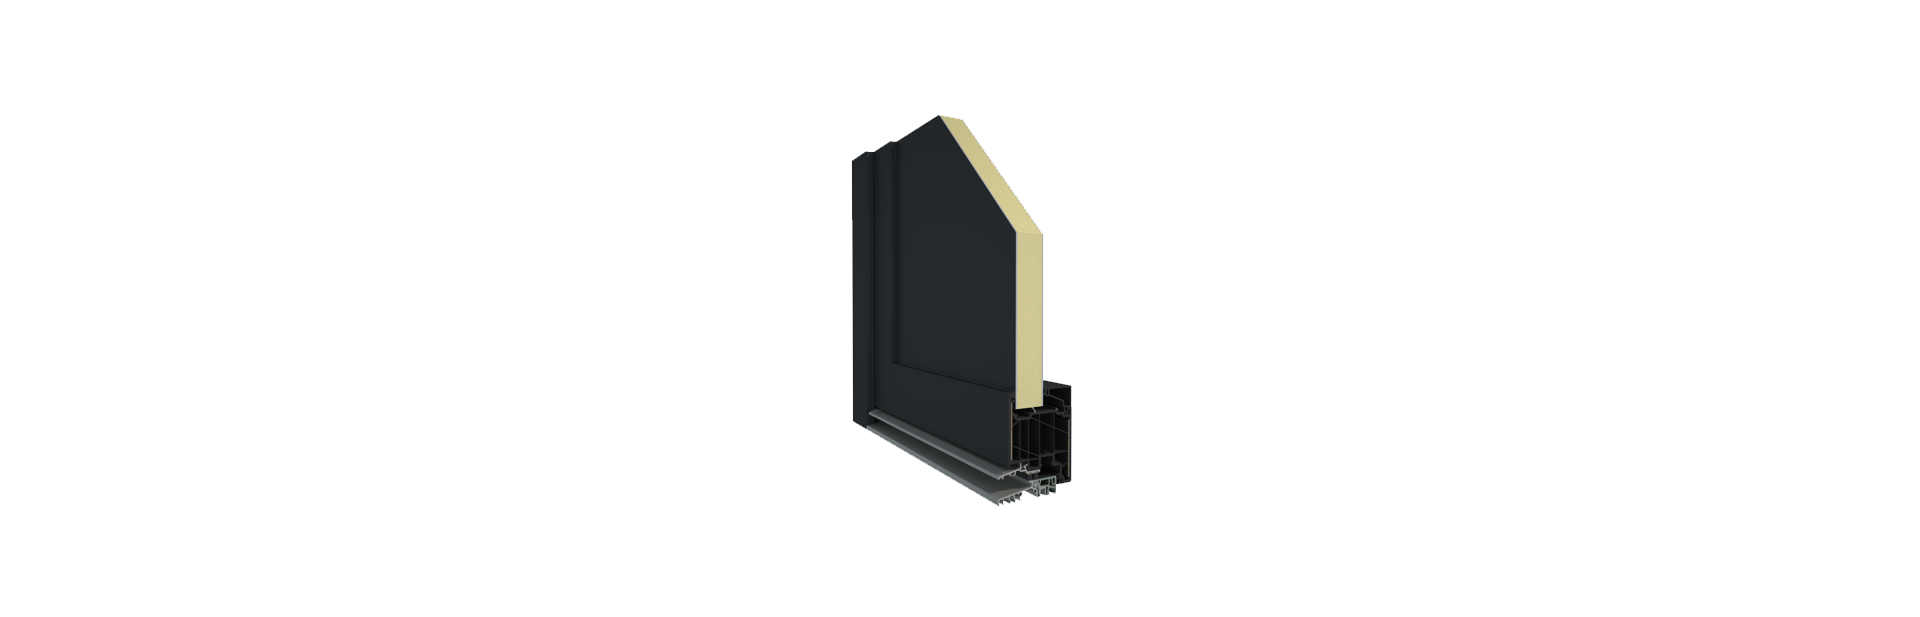 Nov sistem vhodnih vrat iz Deceunincka